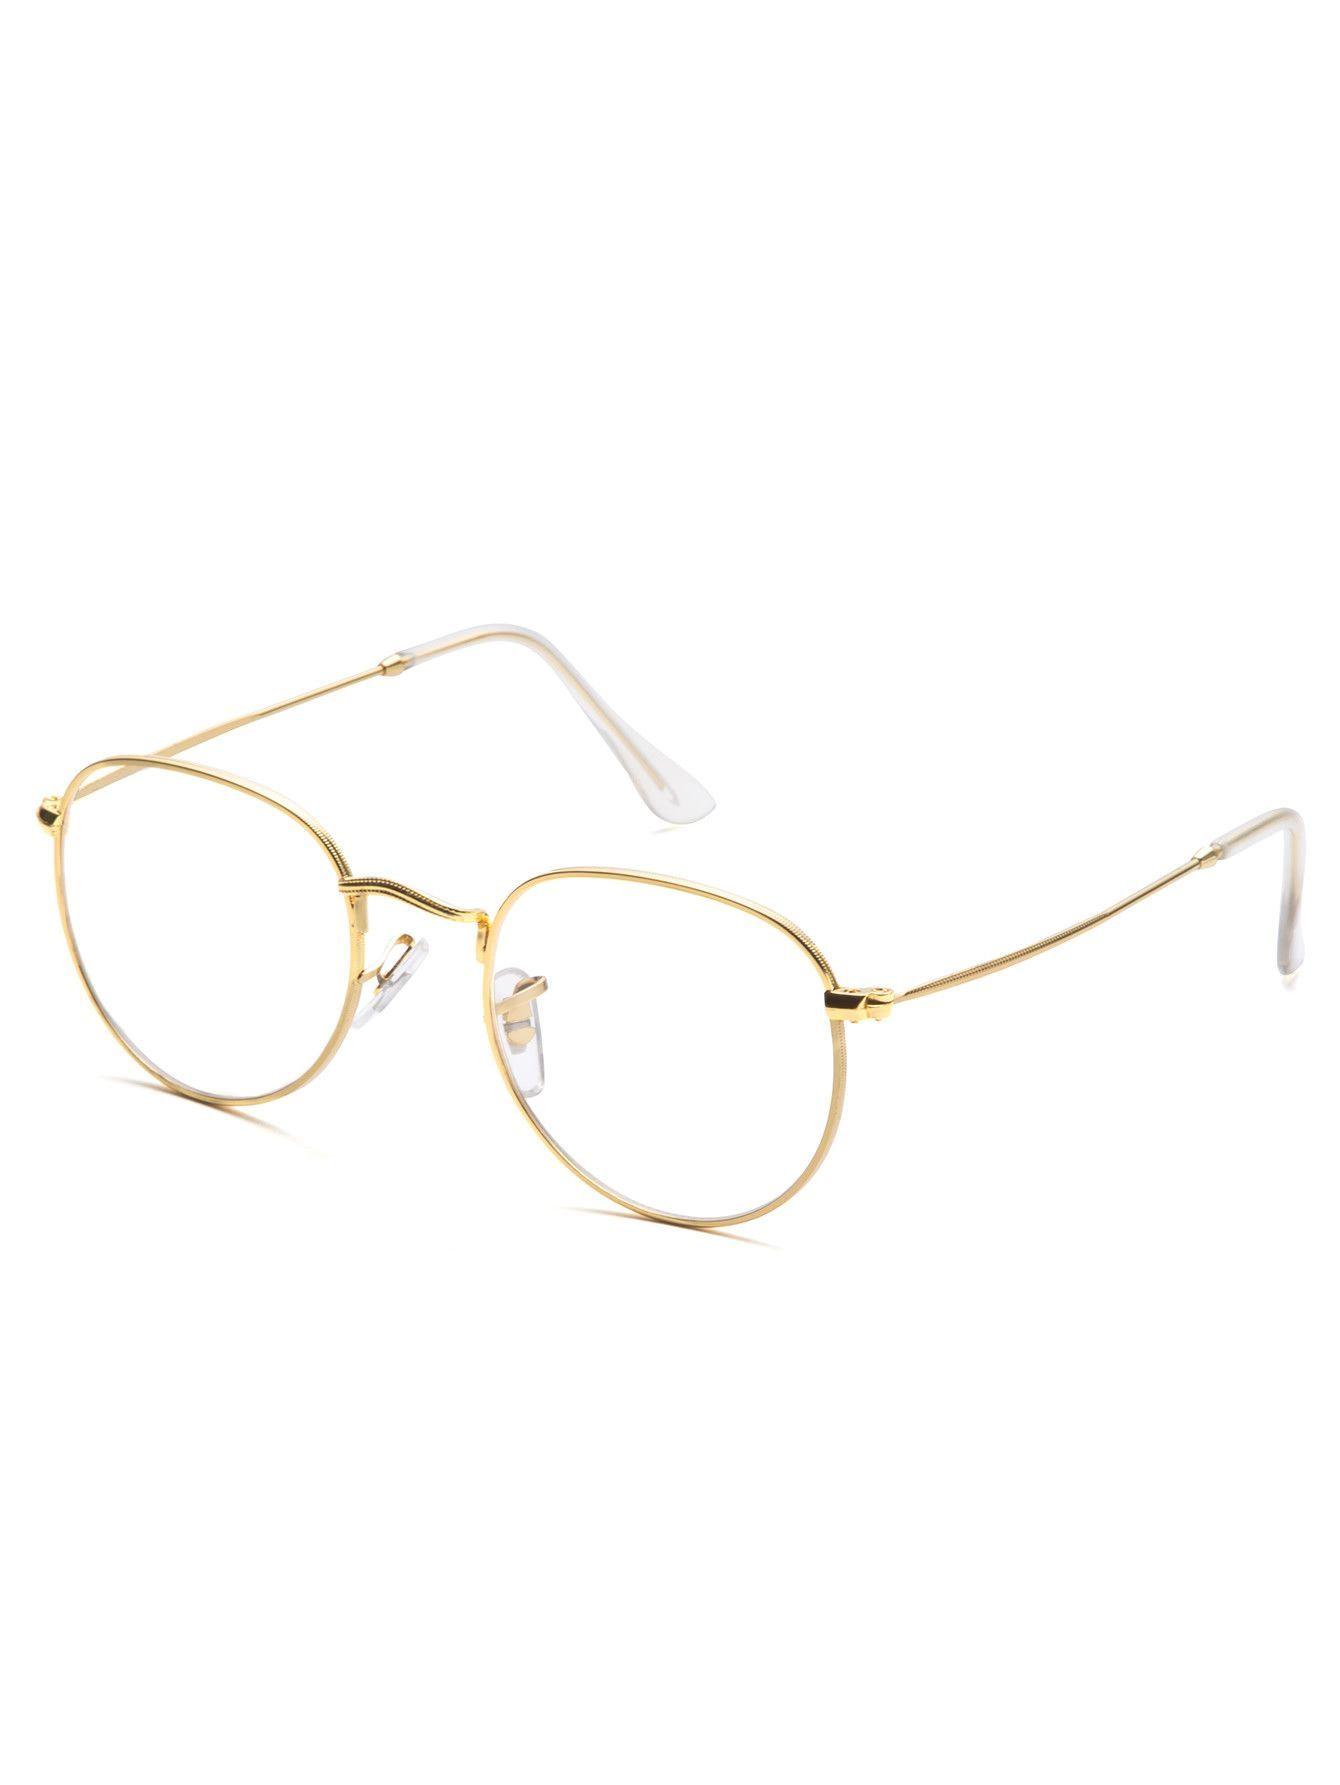 Gold Frame Clear Lens Glasses | promote ur pins ○ㅅ○ | Pinterest ...